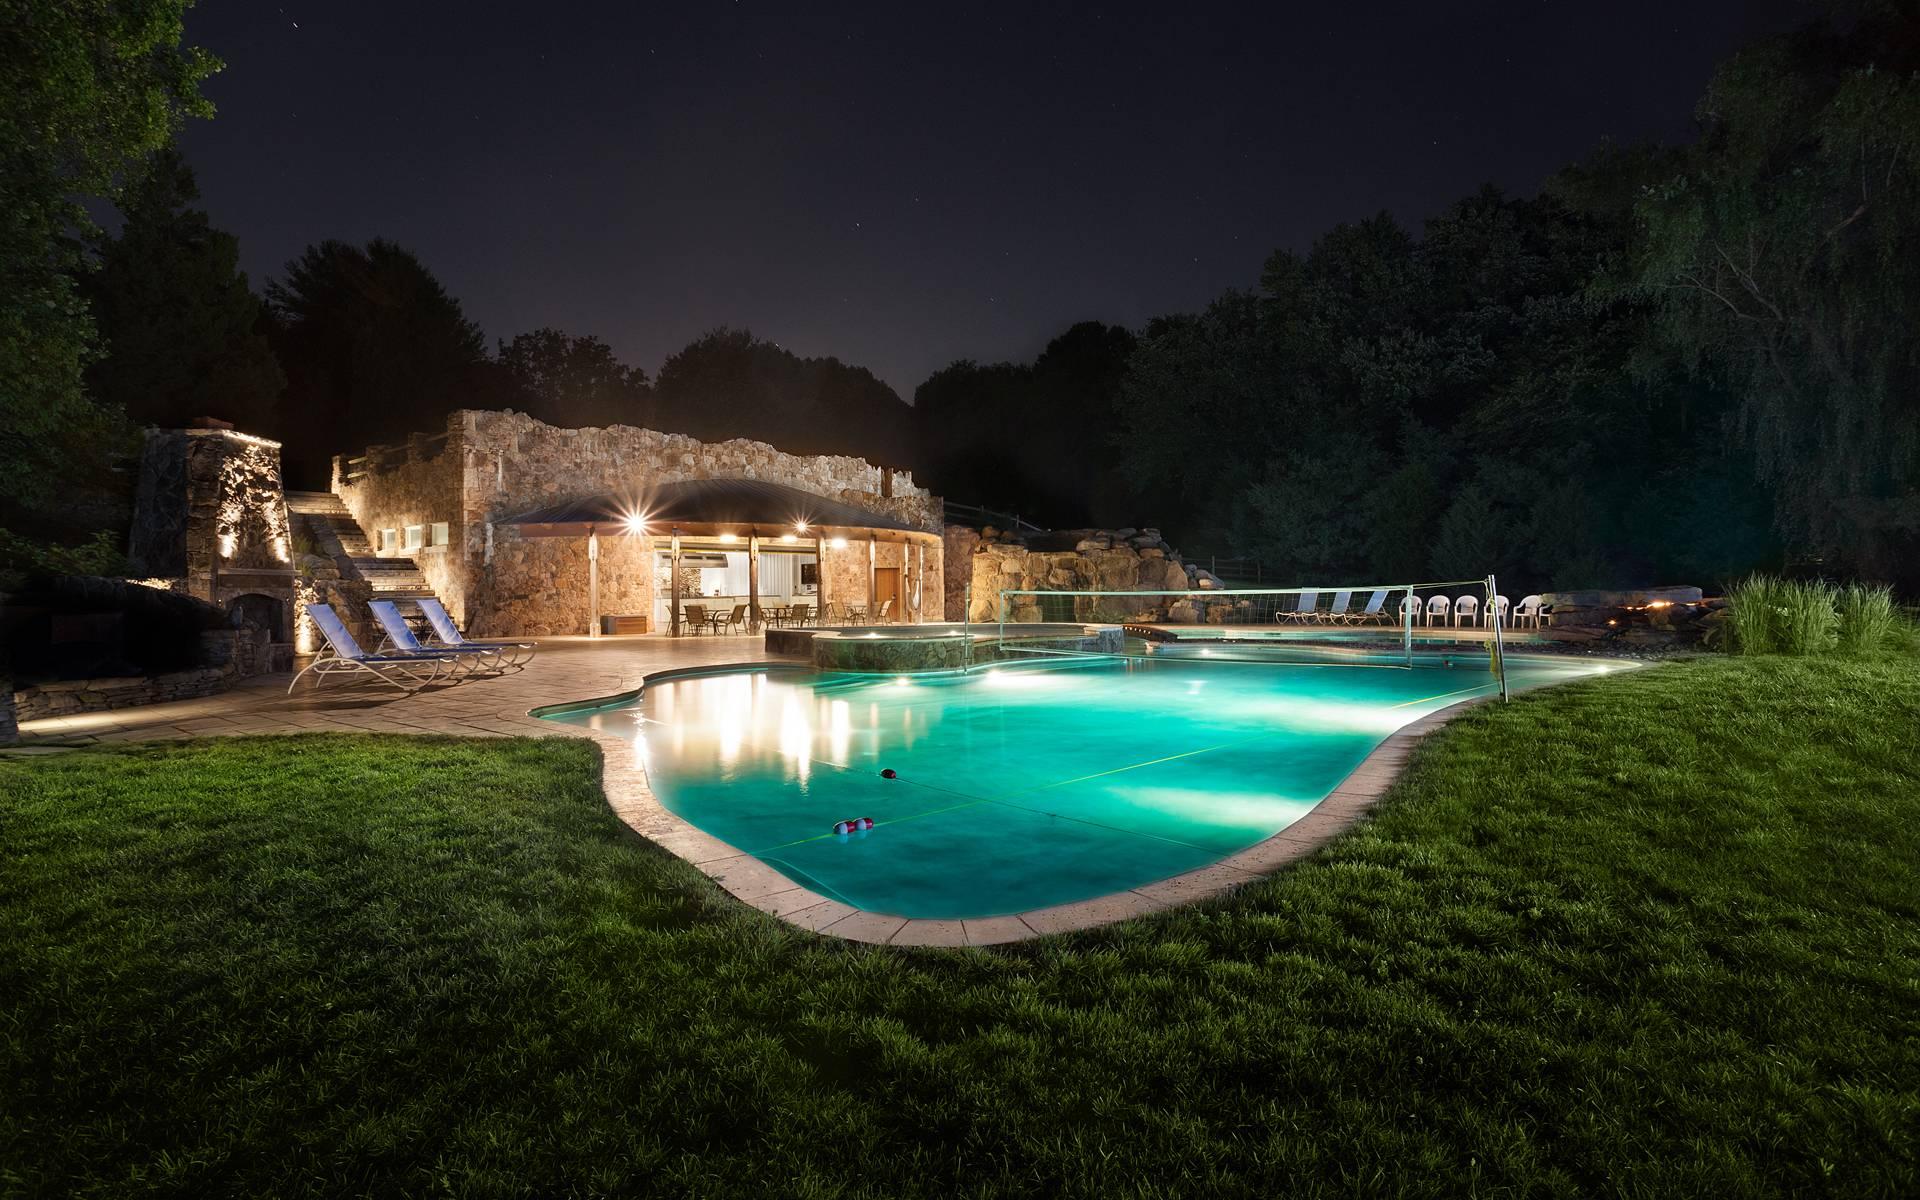 Download full size A beautiful HDR pool Pools wallpaper / 1920x1200